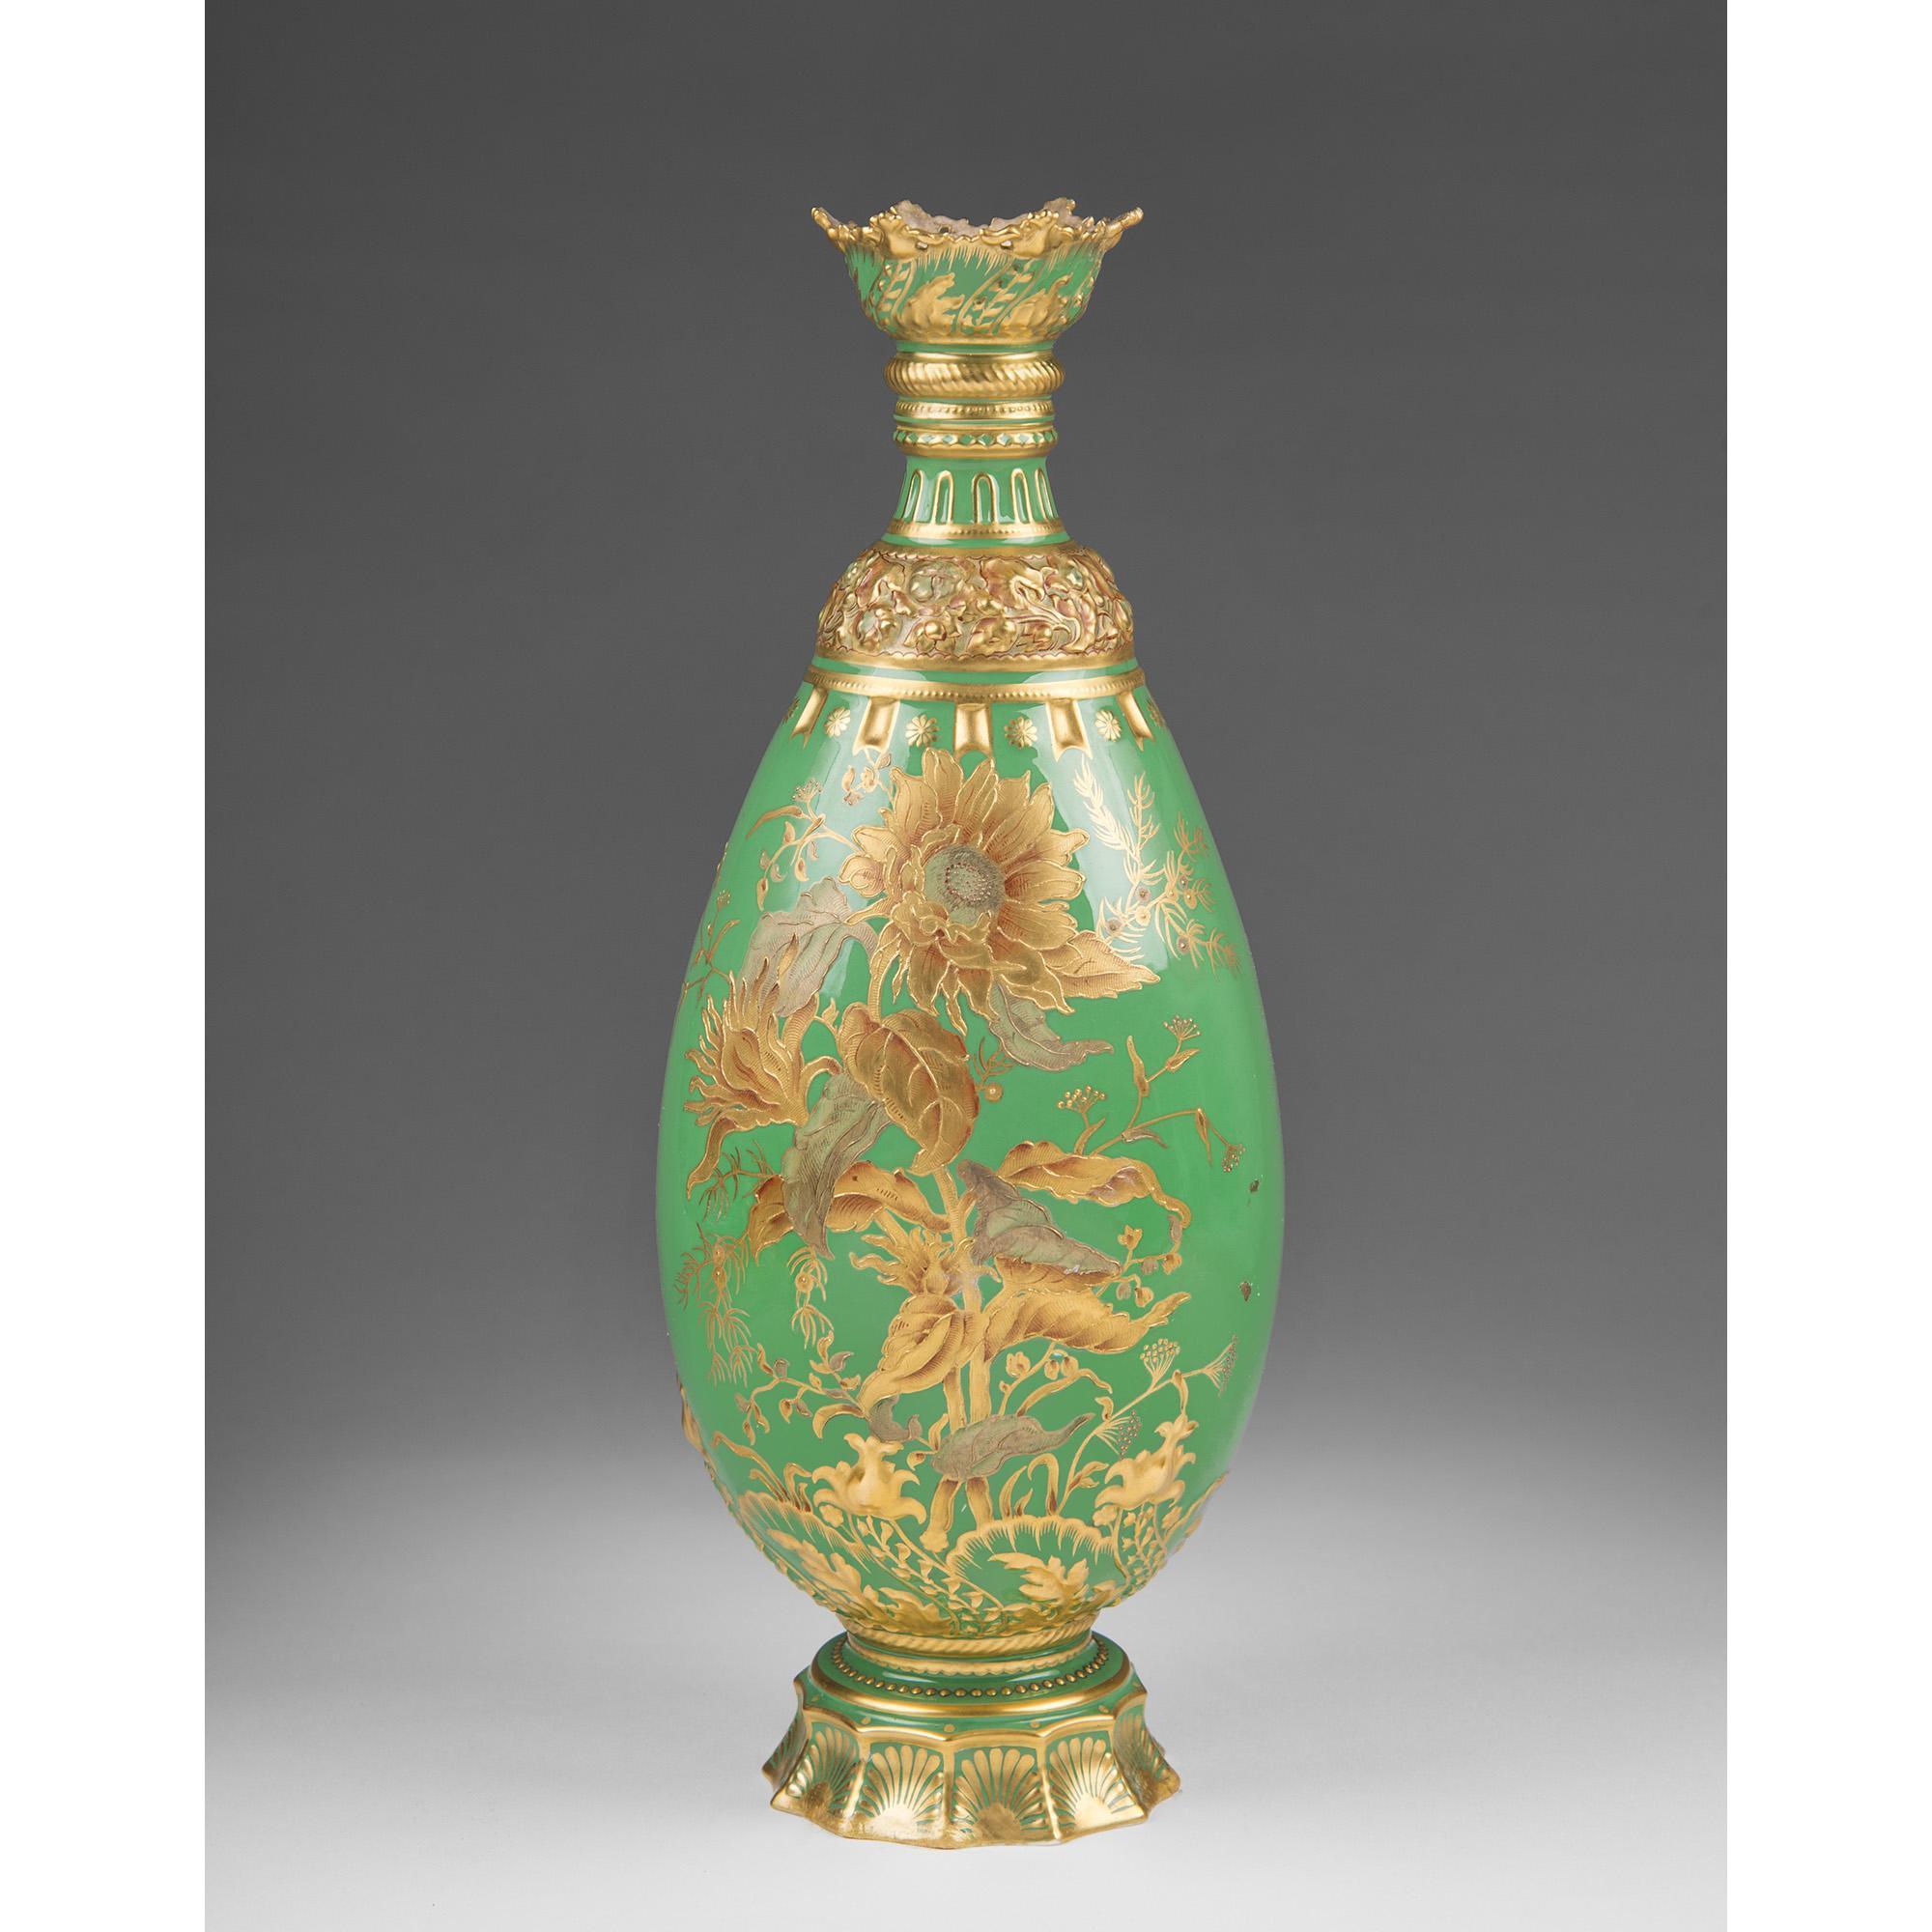 1891 Aesthetic Movement Royal Crown Derby Vase